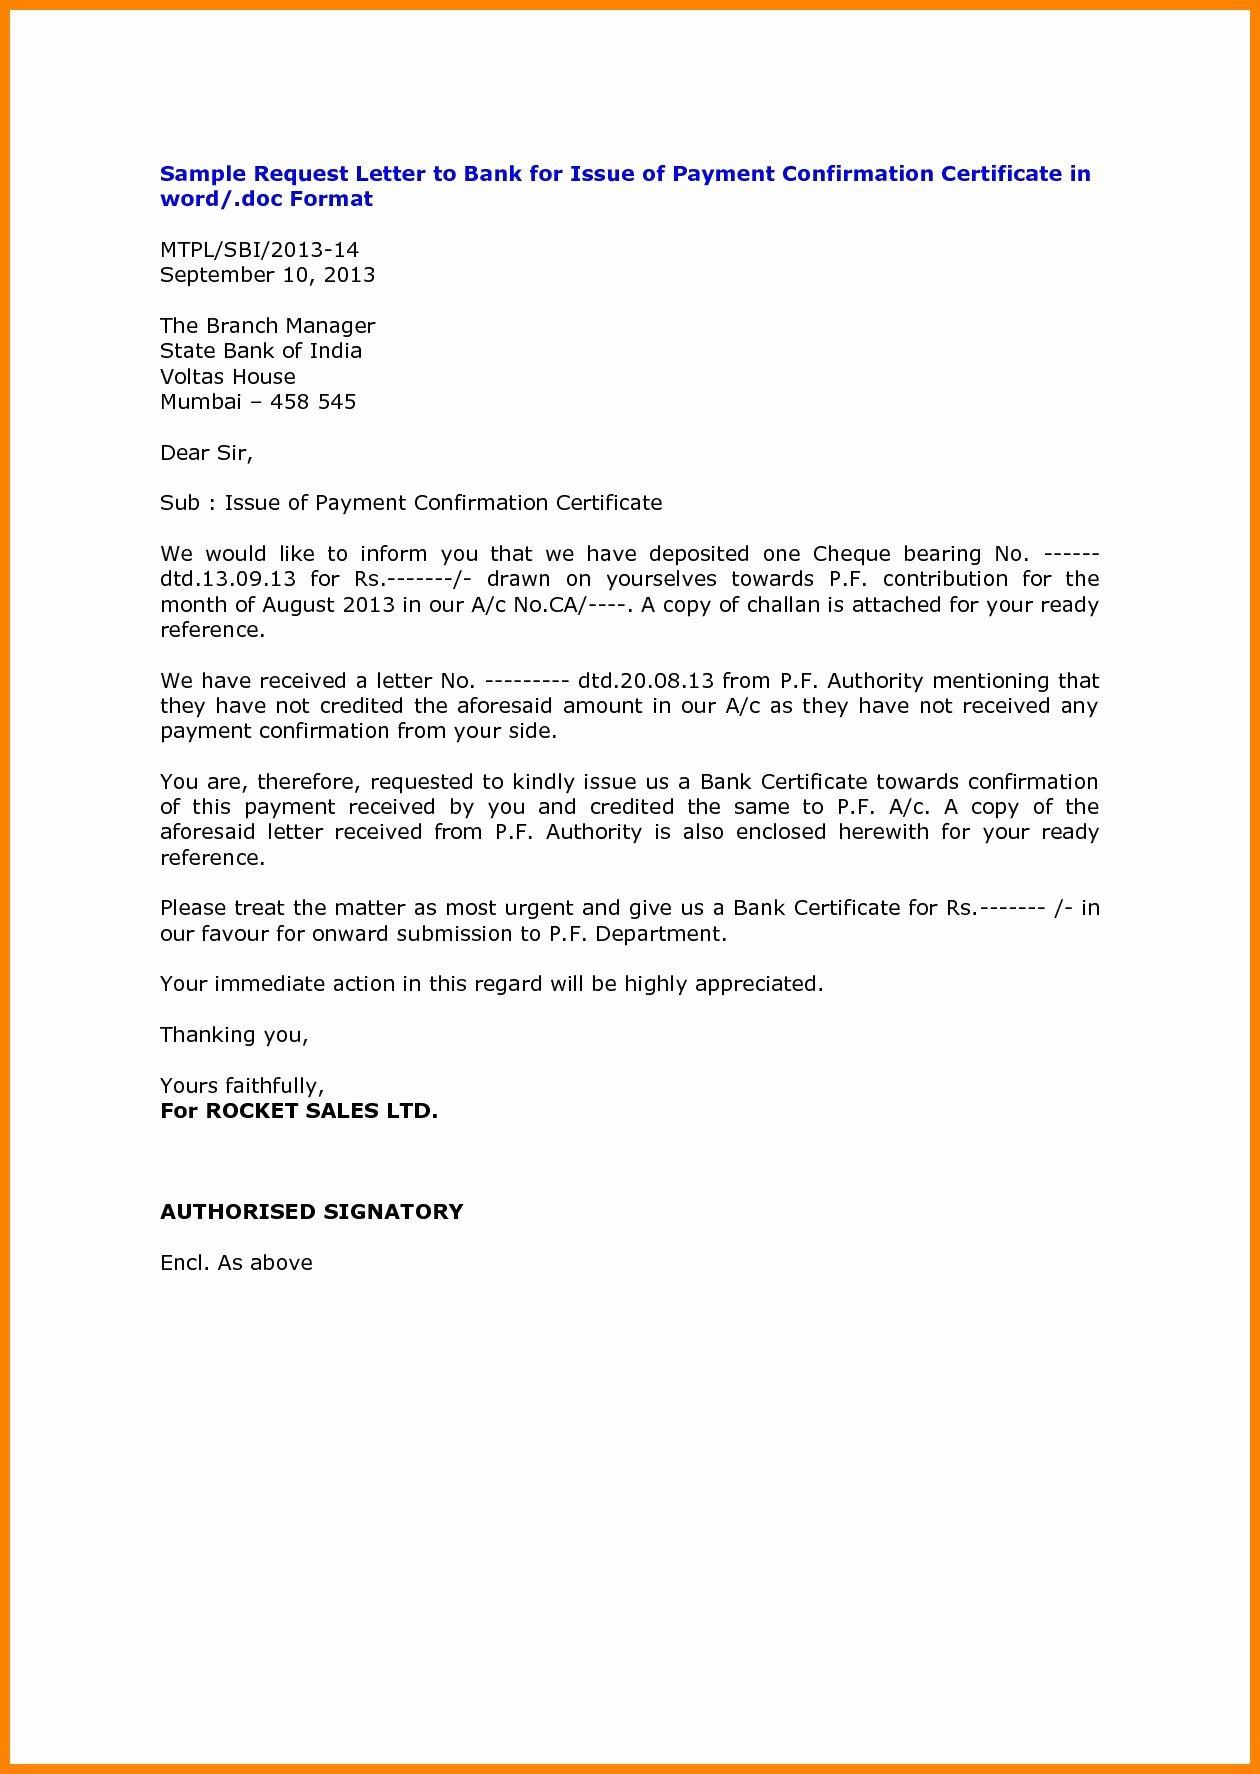 Employment Verification Letter Template Word Elegant 10 Employment Verification Letter Template Word